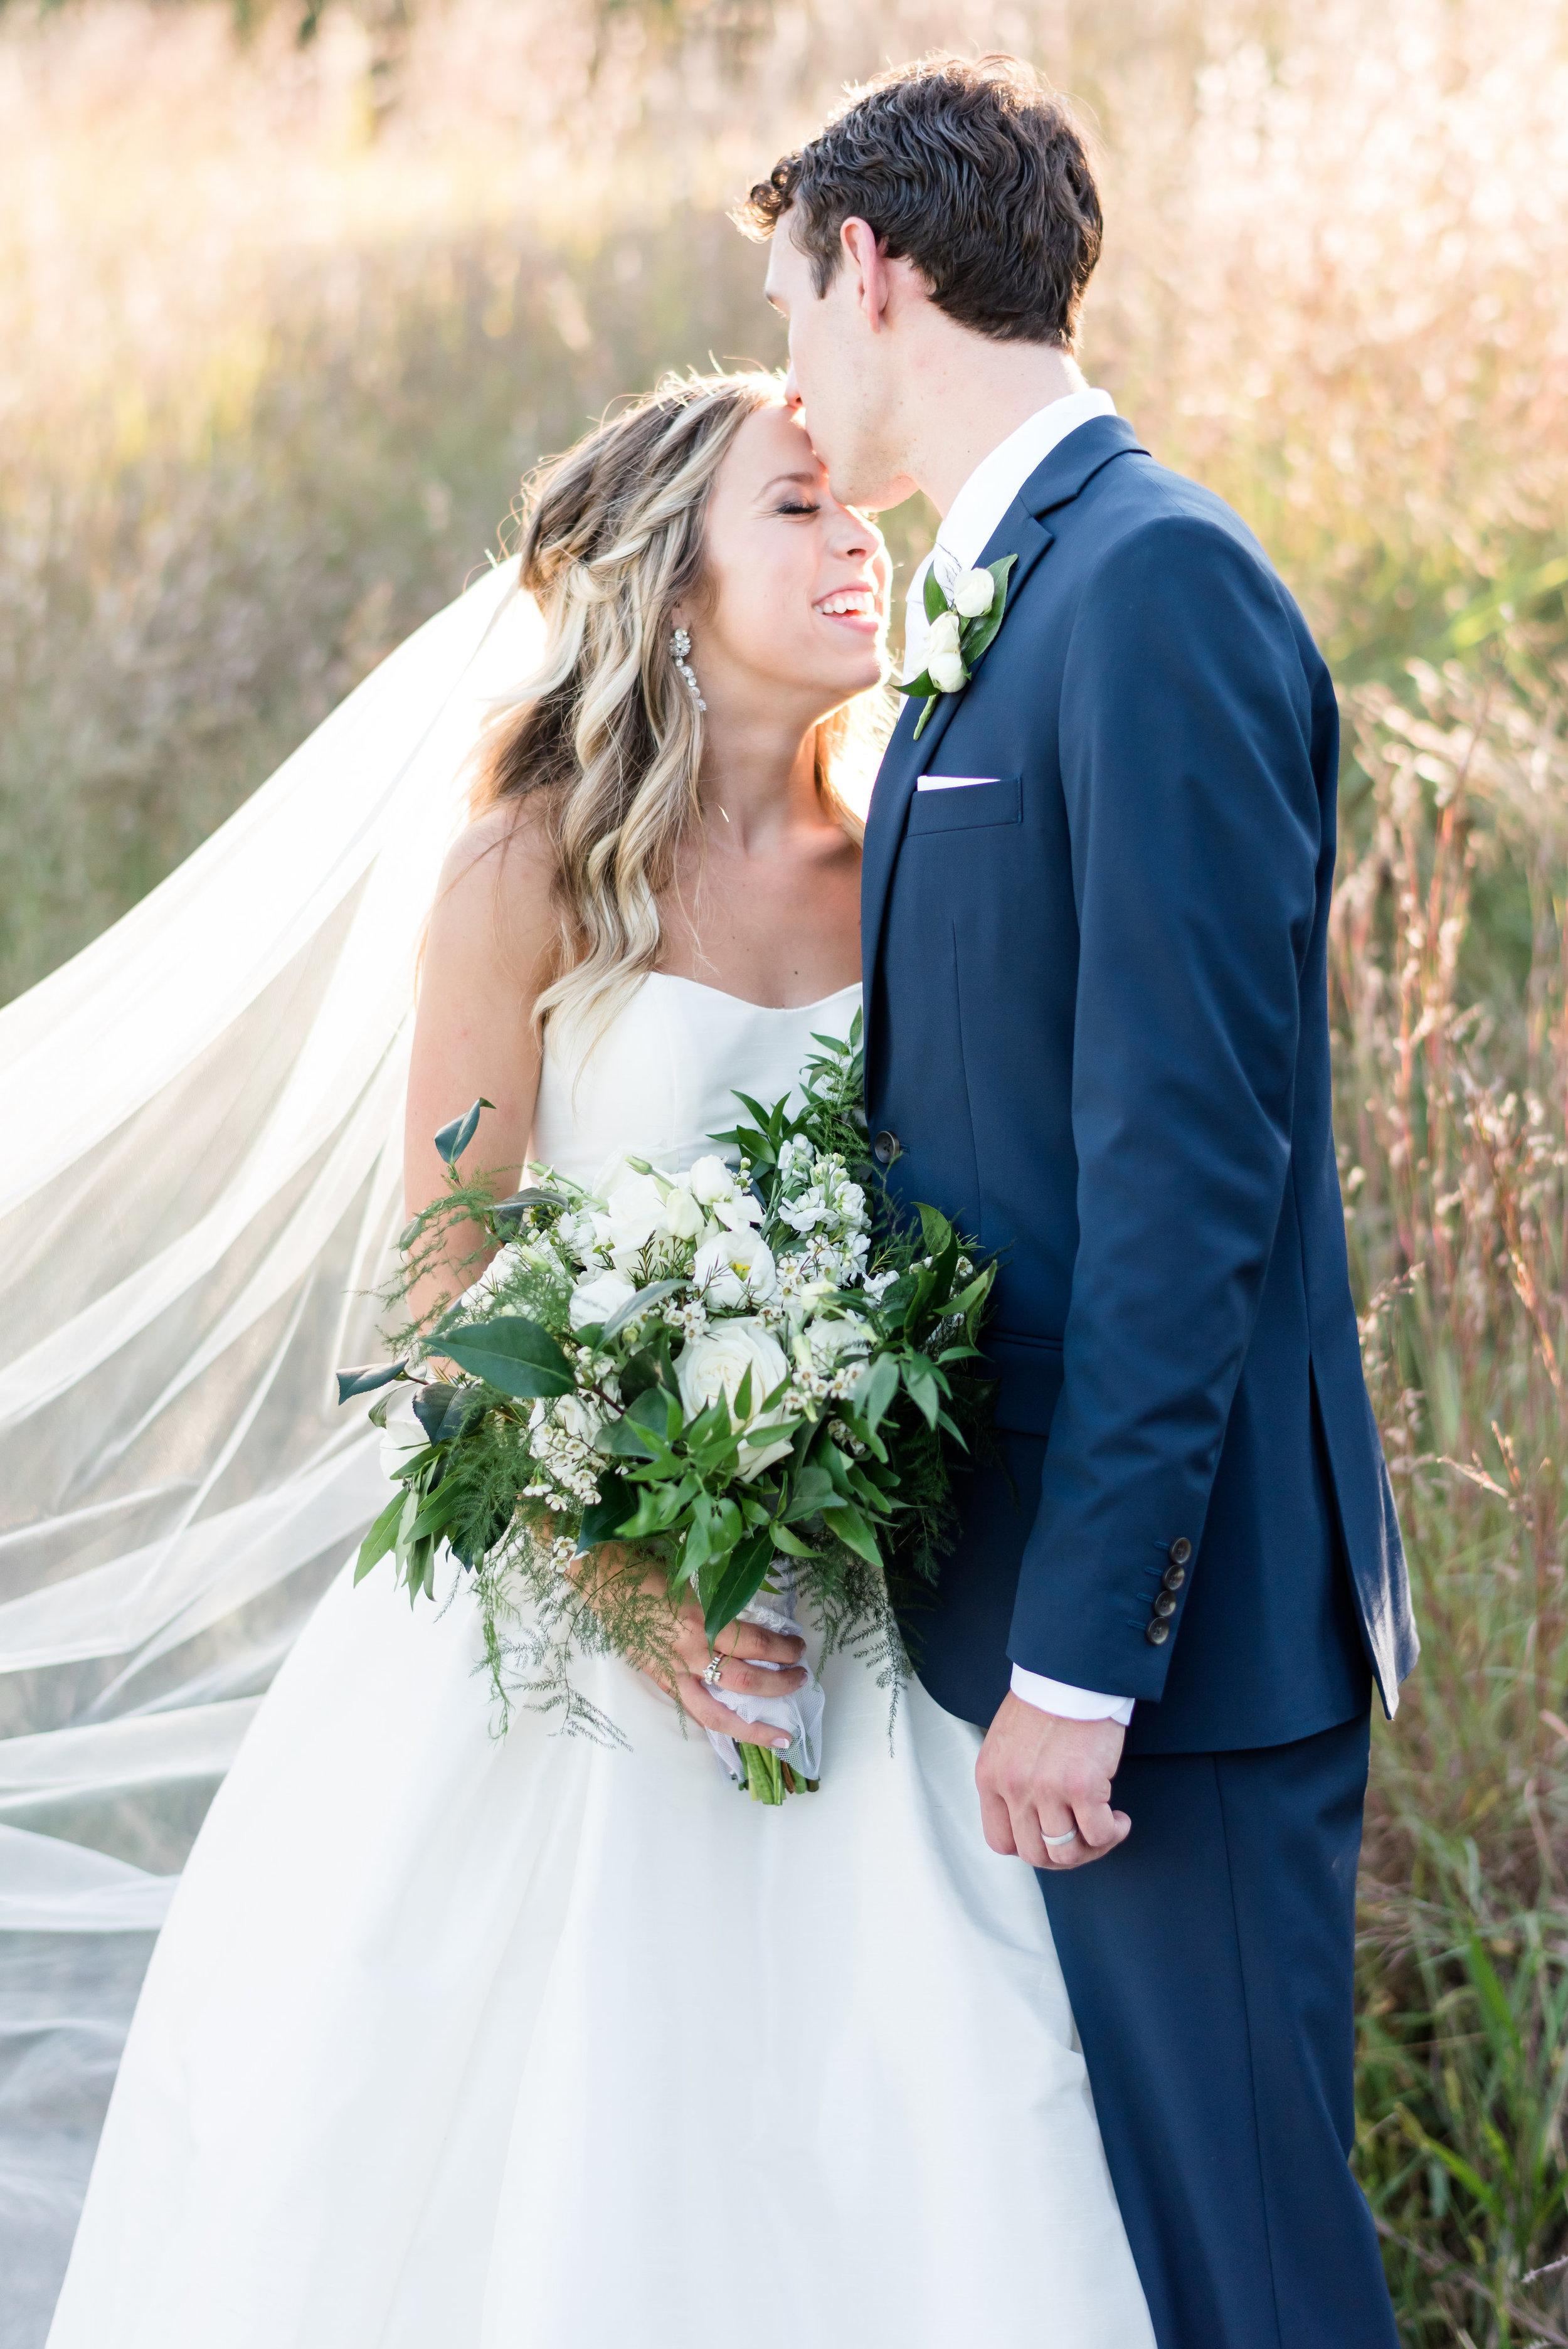 The Dugenske Wedding 9 15 18-0747.jpg